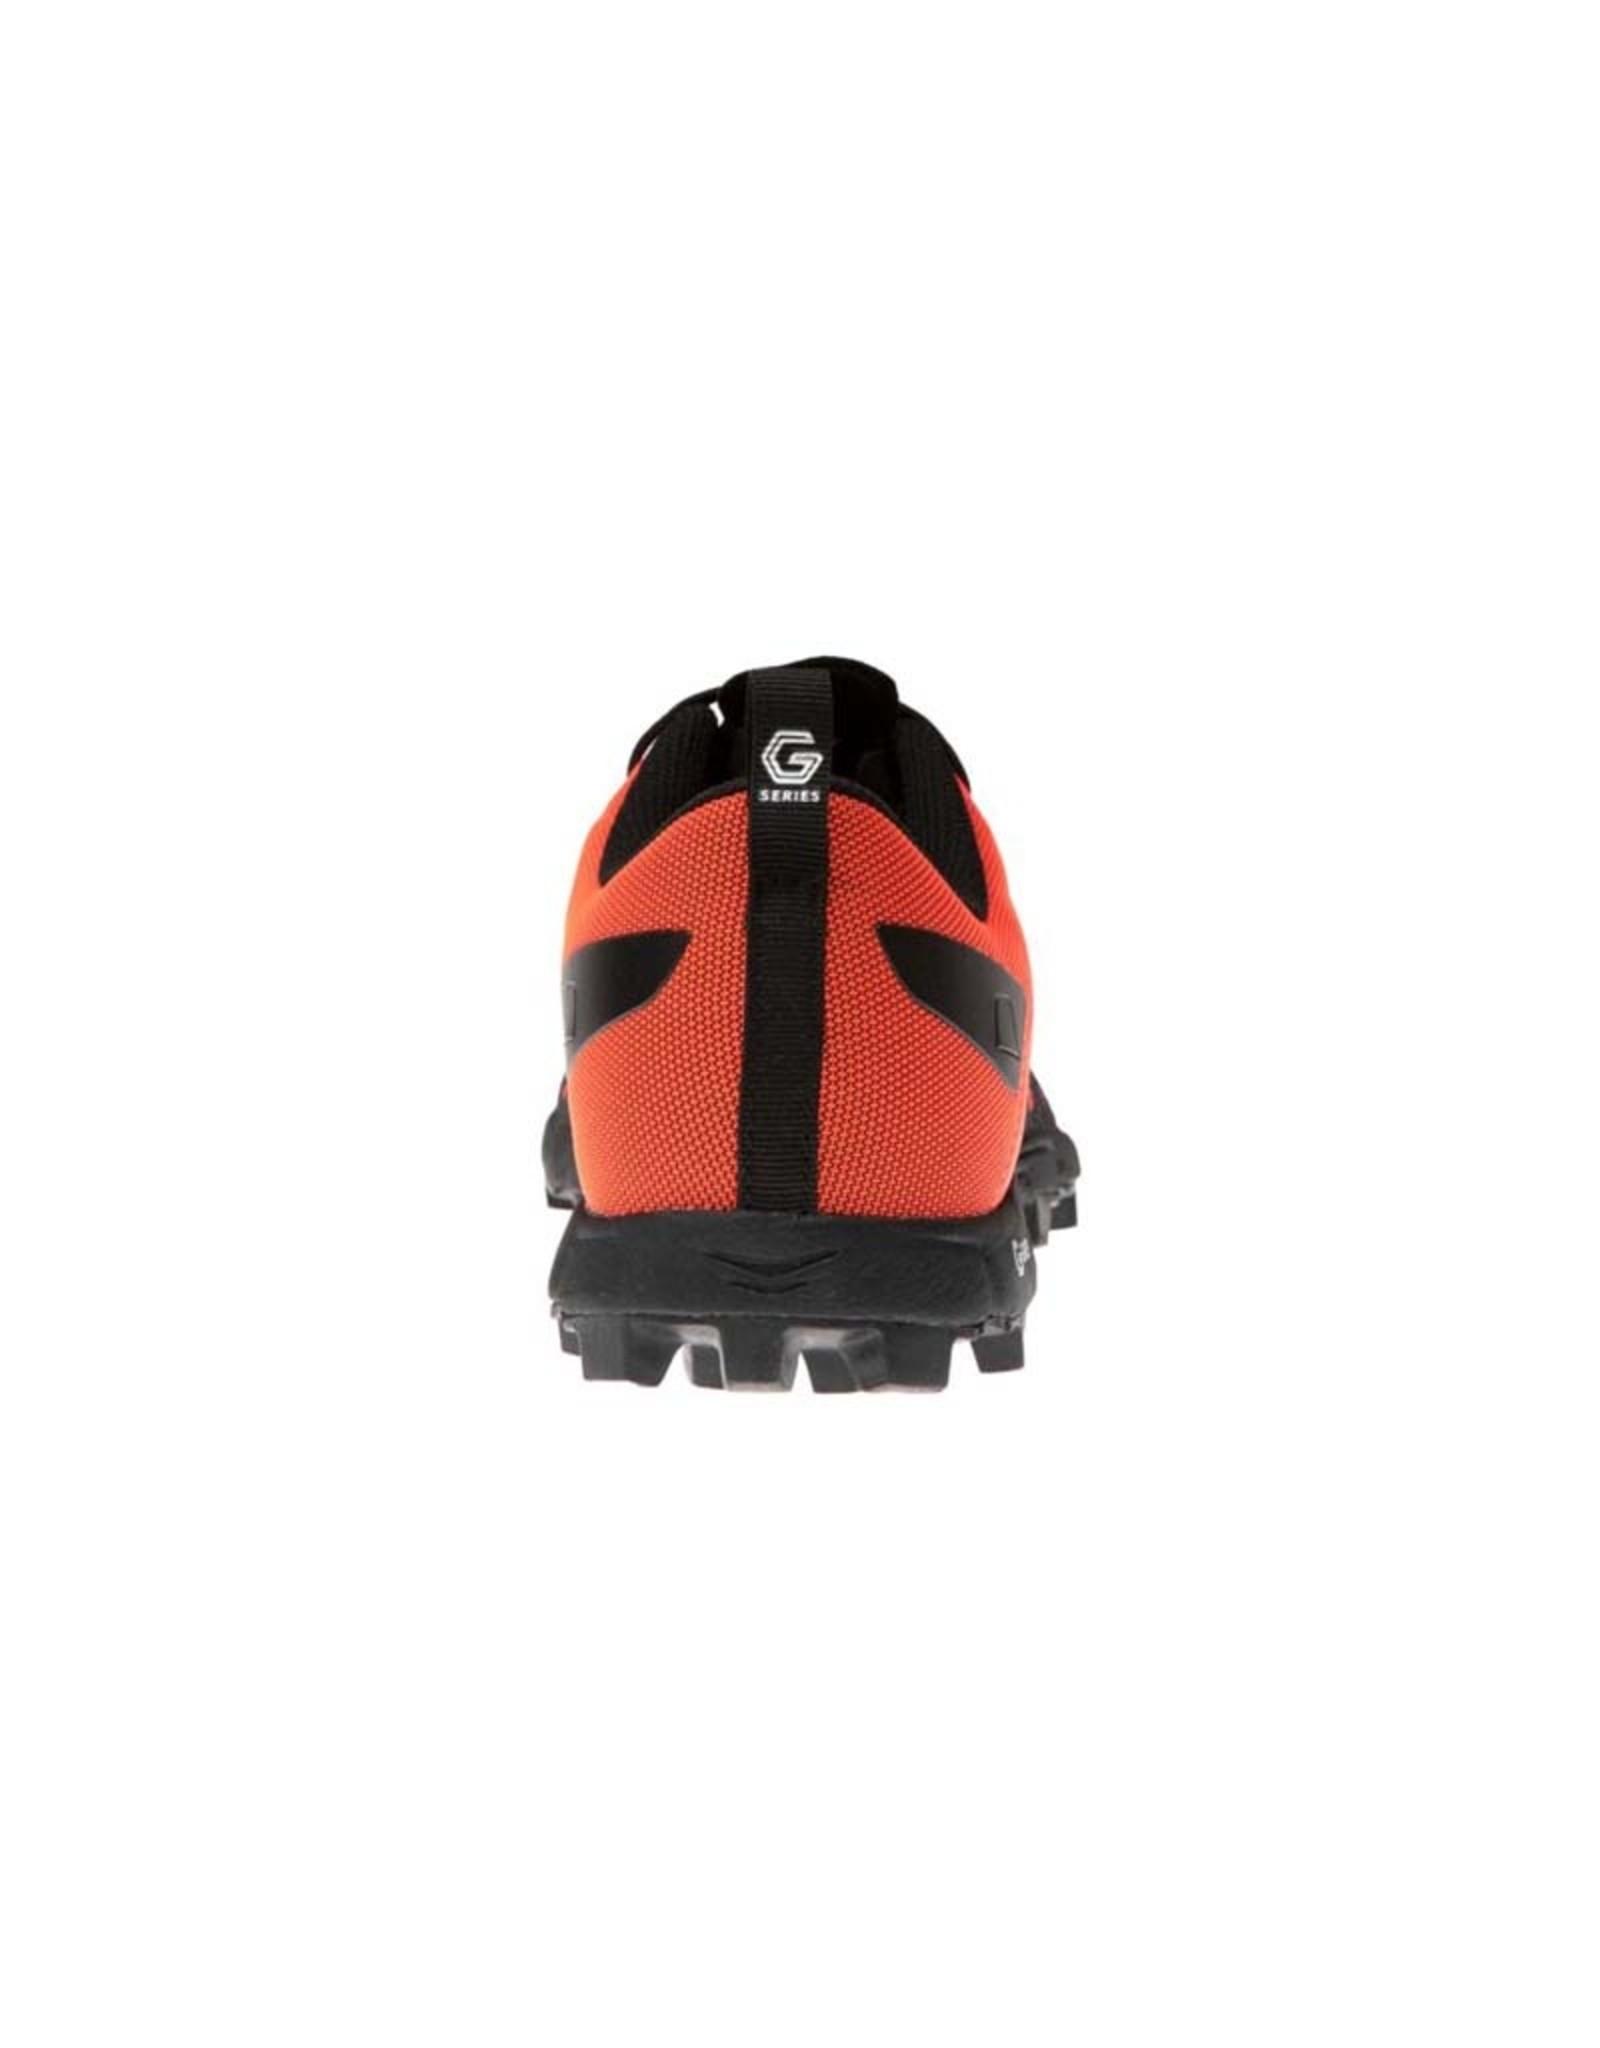 Inov-8 X-Talon G 235 OCR En Survivalrunschoen - Oranje/Zwart